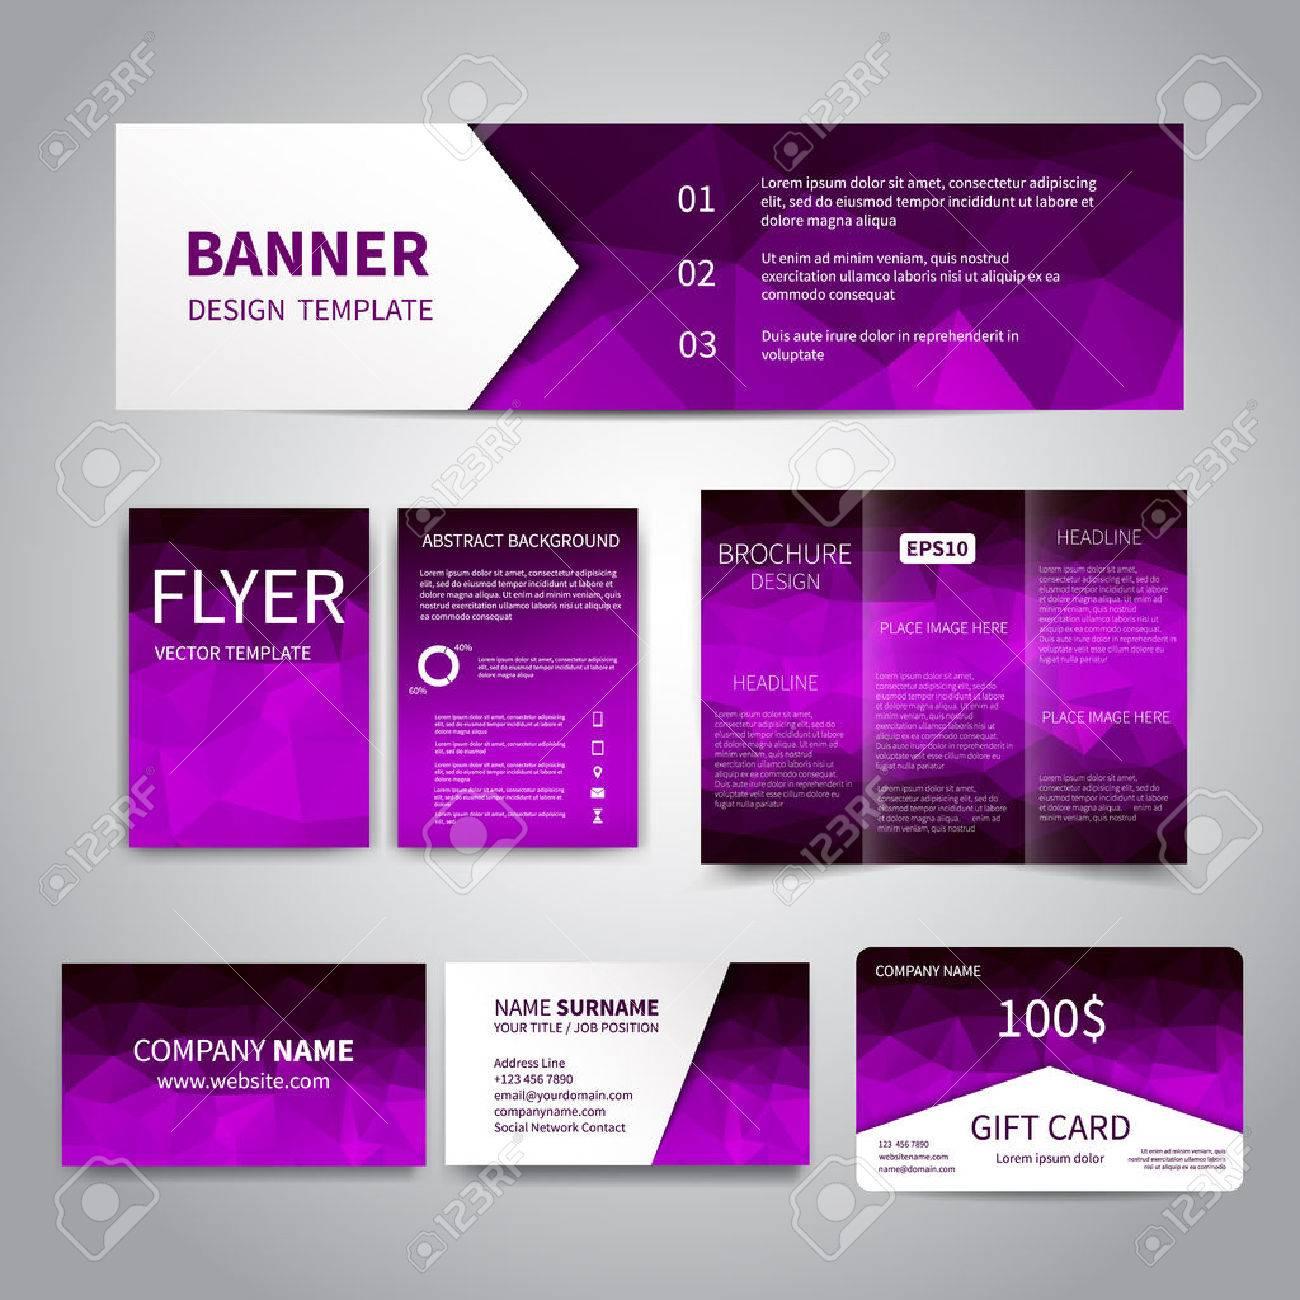 Banner, Flyers, Brochure, Business Cards, Gift Card Design ...